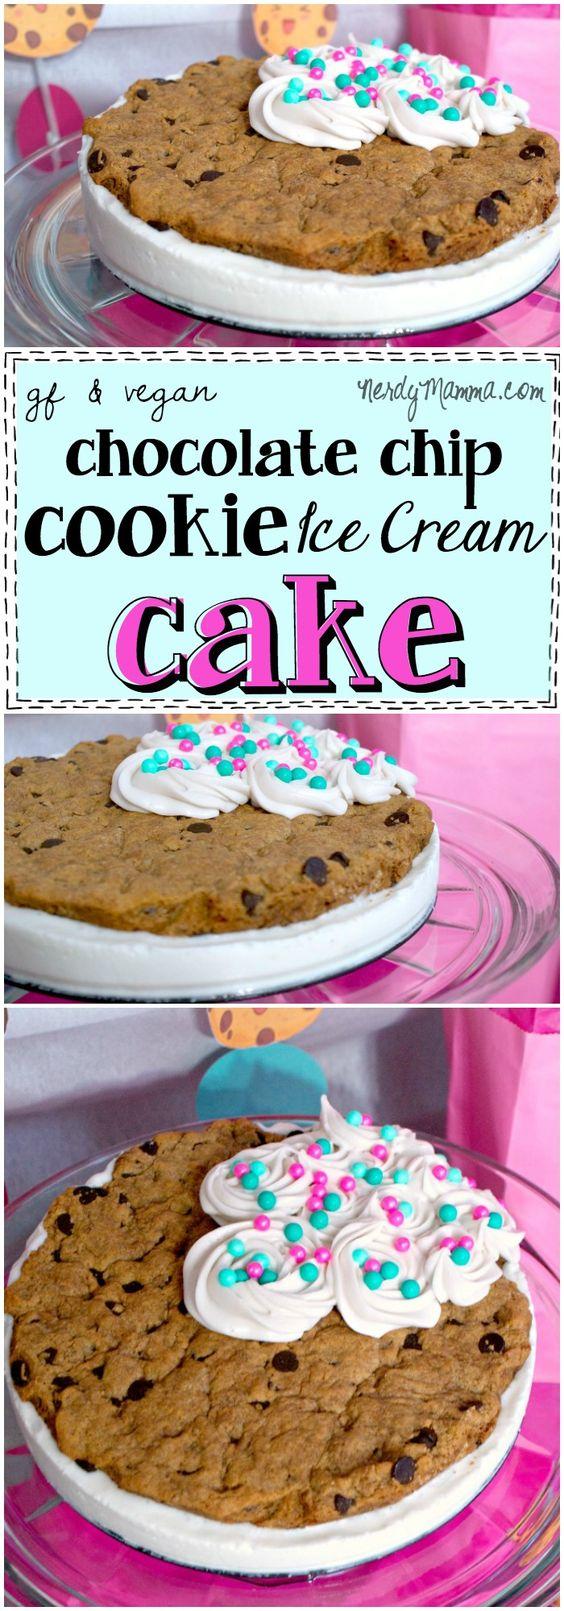 Gluten-Free & Vegan Chocolate Chip Cookie Ice Cream Cake | Recipe ...